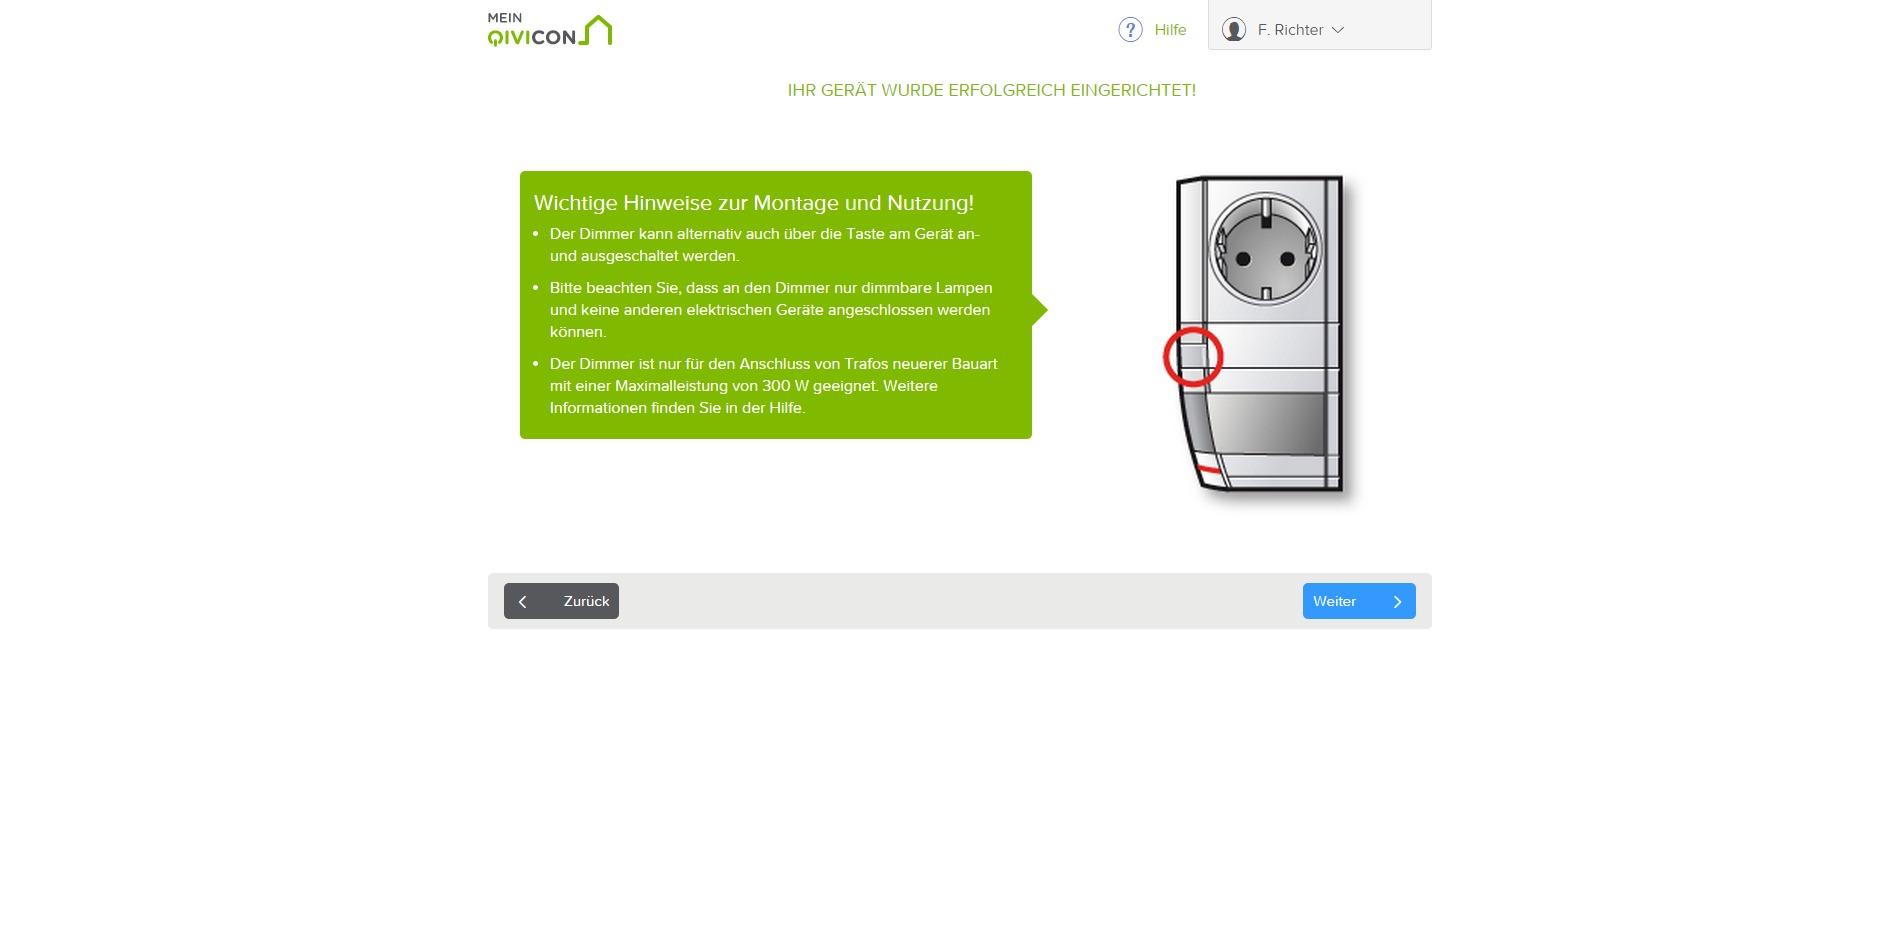 qivicon im test das smart 28 images smart home qivicon qivicon smart home bitron das das. Black Bedroom Furniture Sets. Home Design Ideas